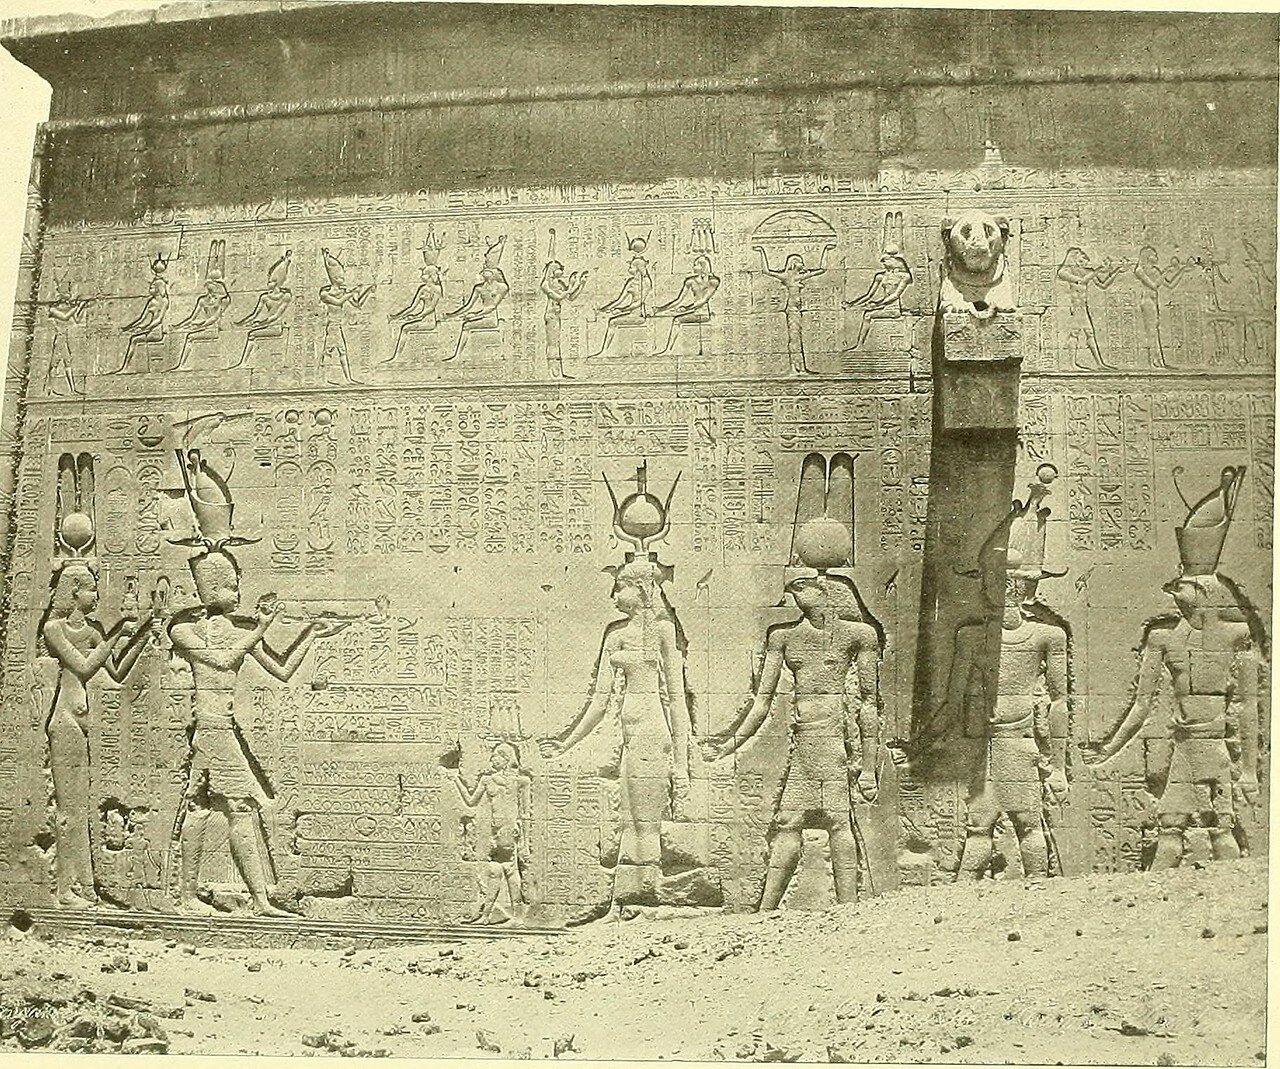 1908. Задняя сторона храма